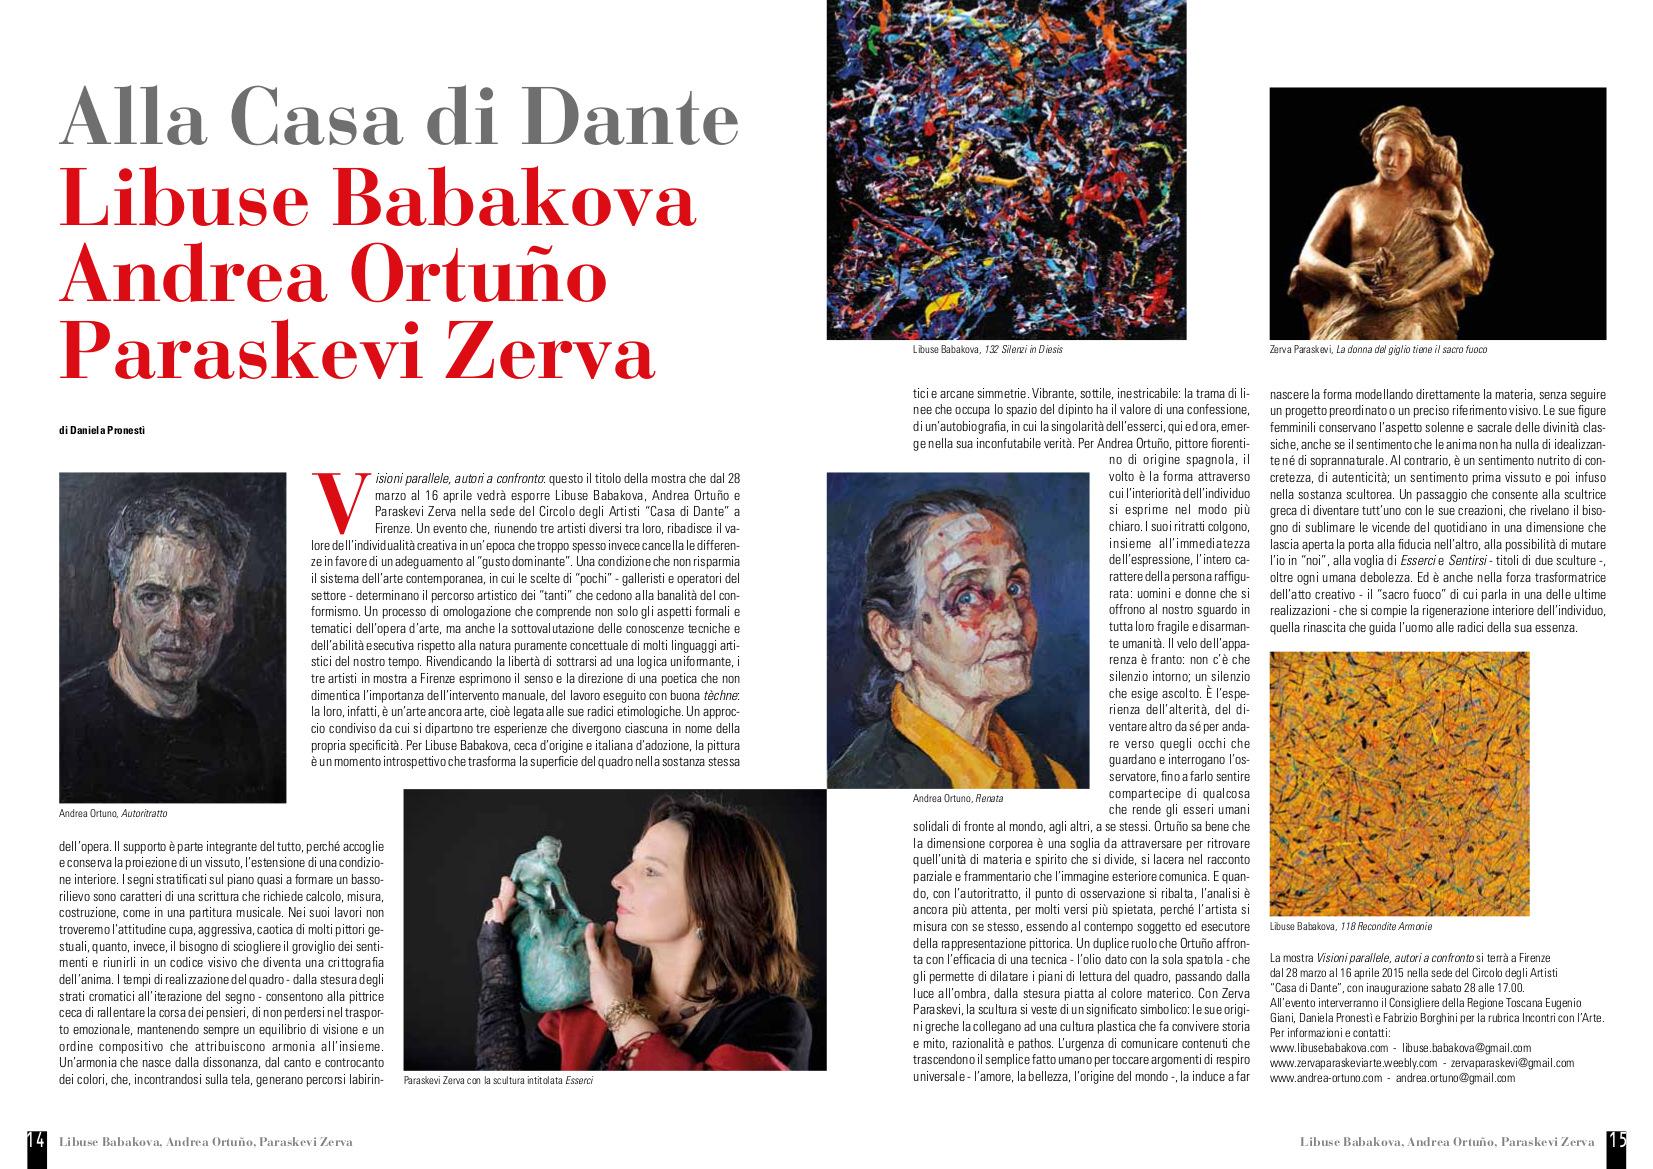 Toscana Arte - Visioni Parallele